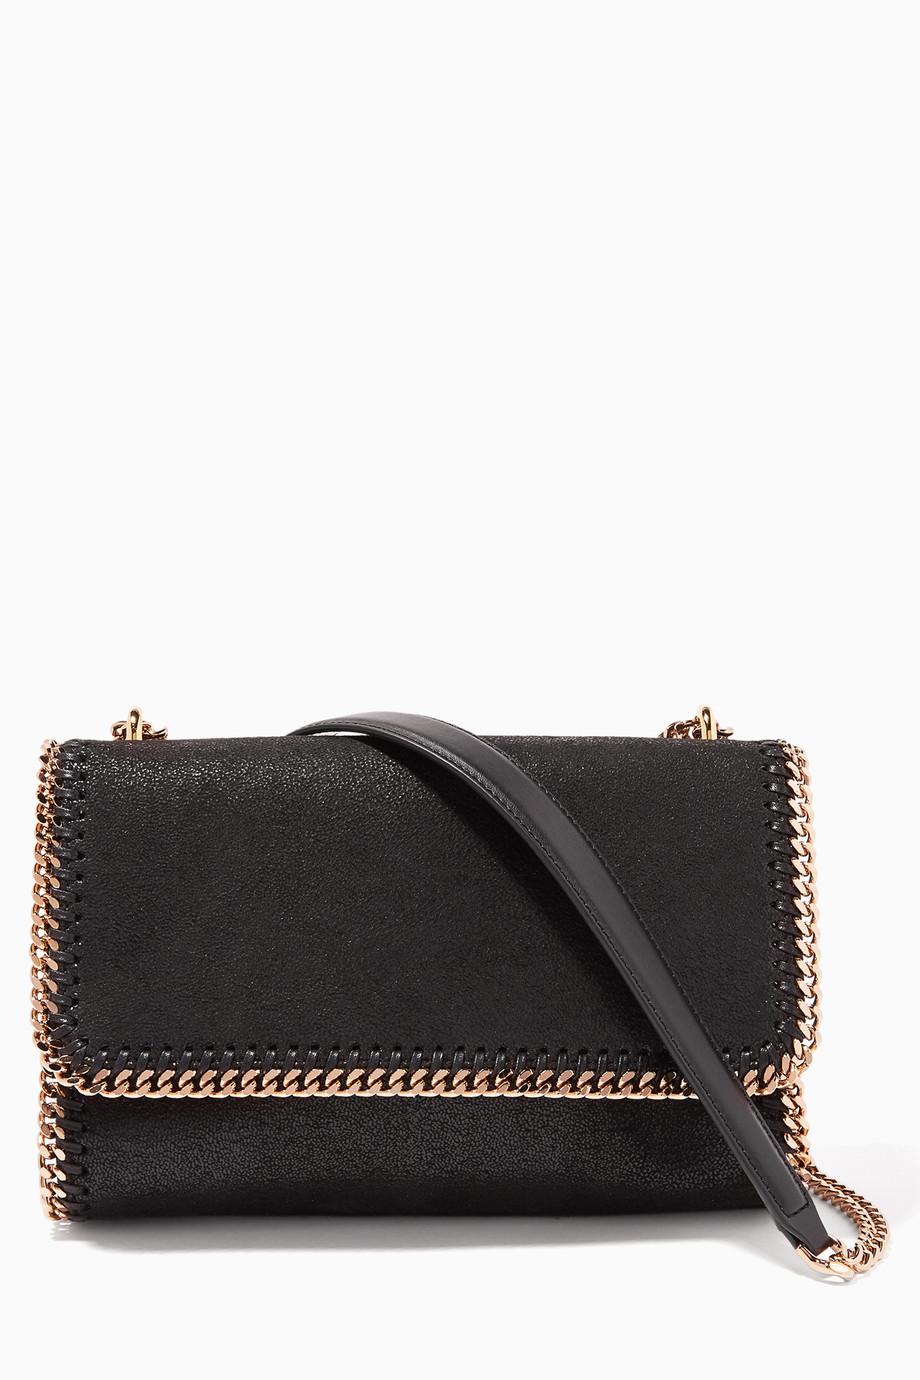 23400adf5a632 Shop Stella McCartney Black Black Falabella Shaggy Deer Shoulder Bag ...